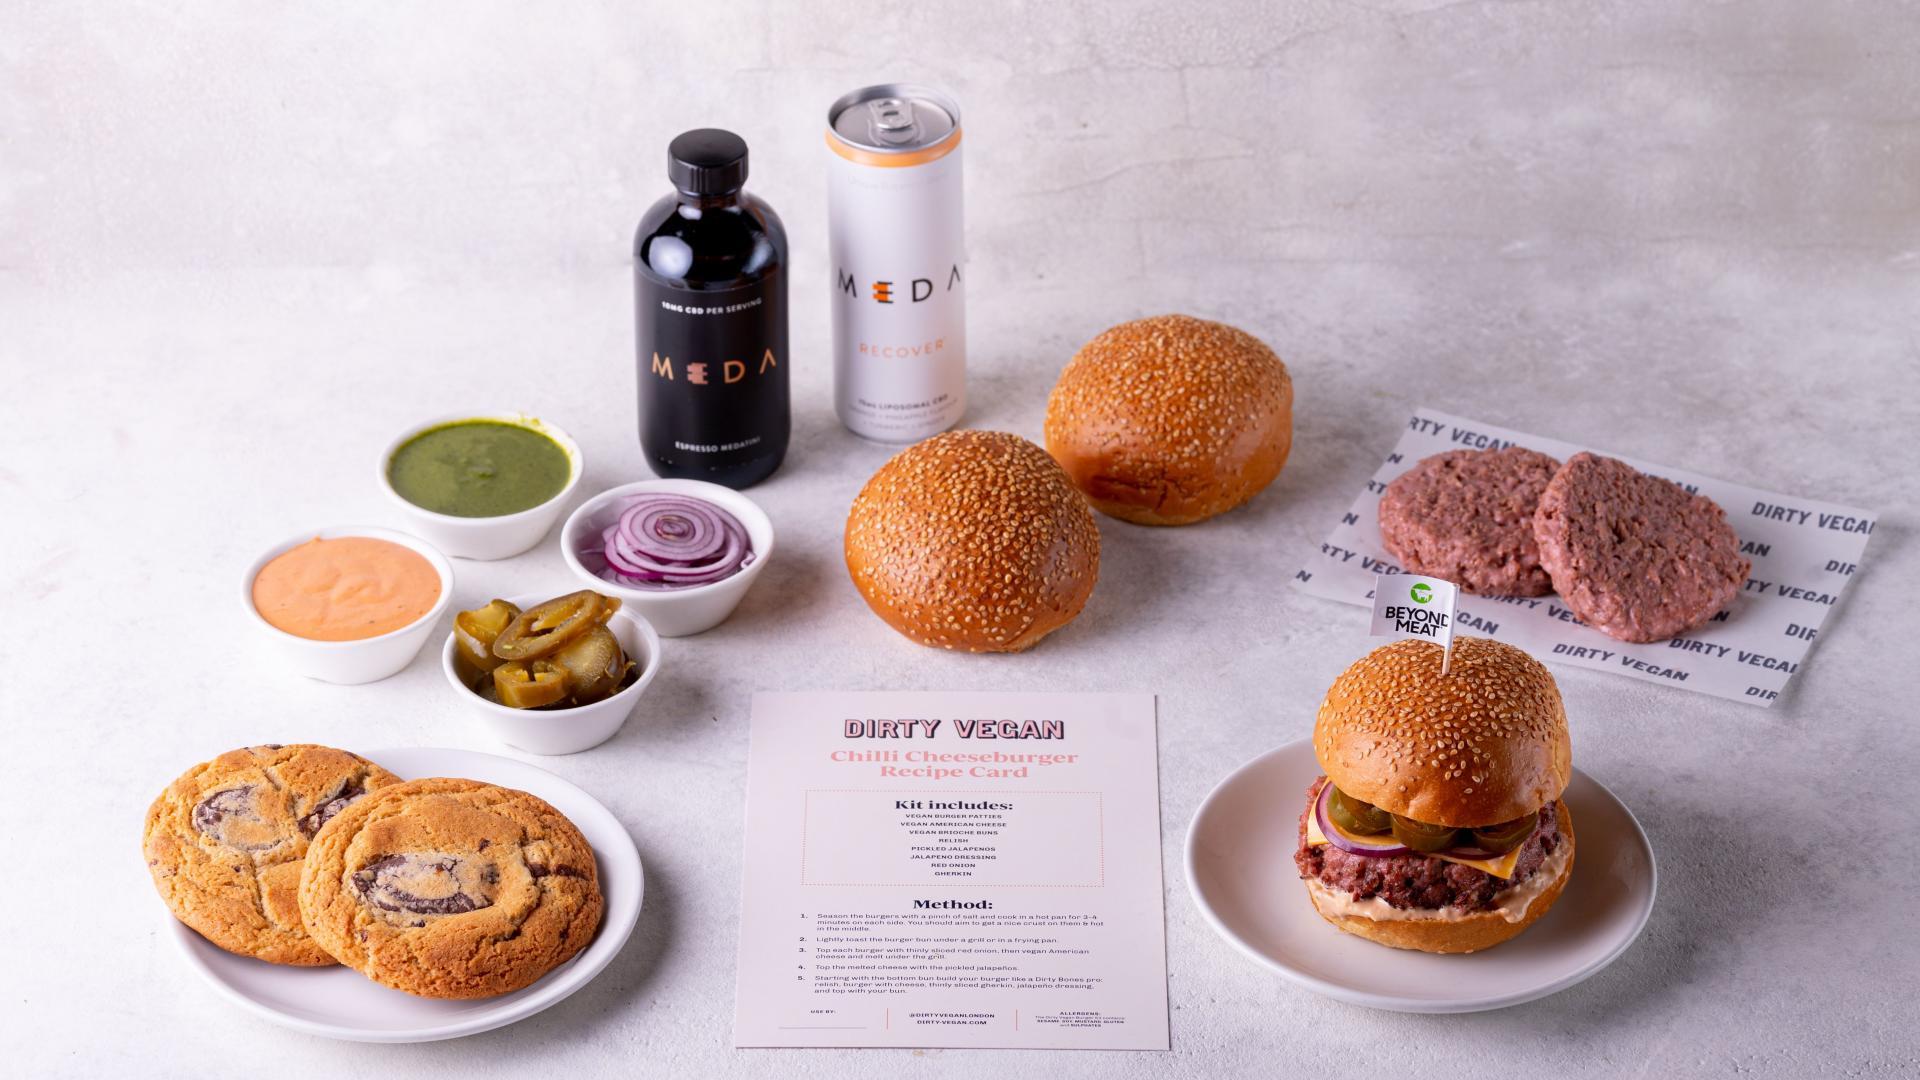 Vegan meal kits and DIY boxes: Dirty Vegan's burger